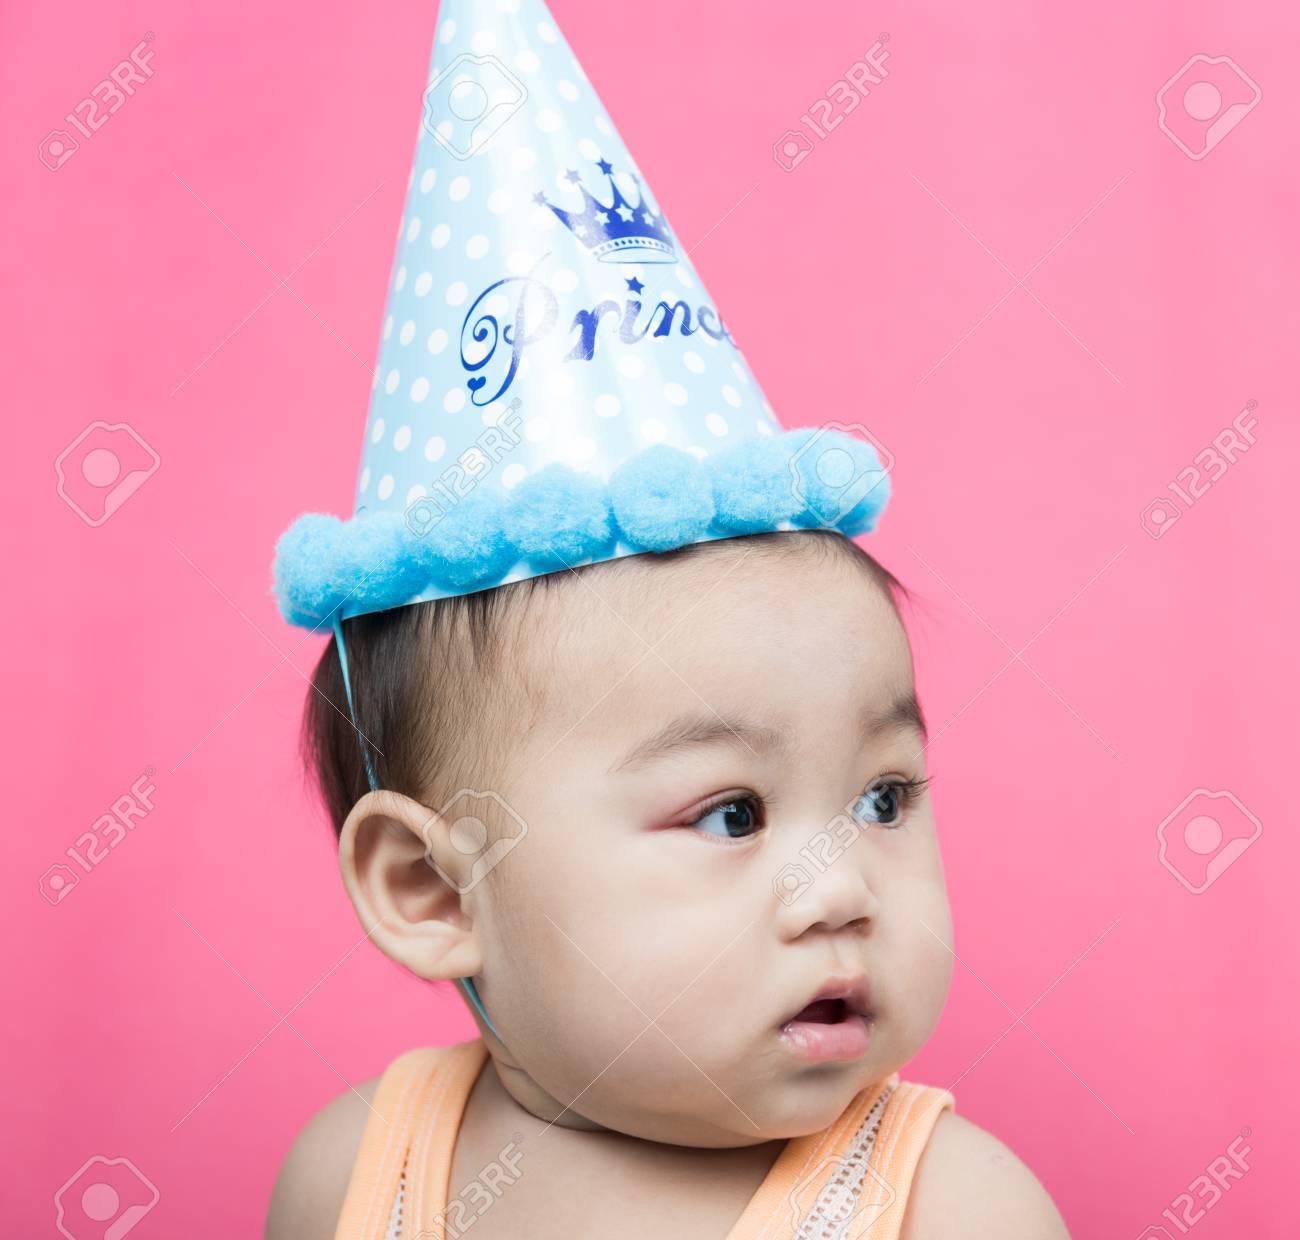 Asia Baby Boy Wearing Birthday Party Hat On Pink Background Standard Bild